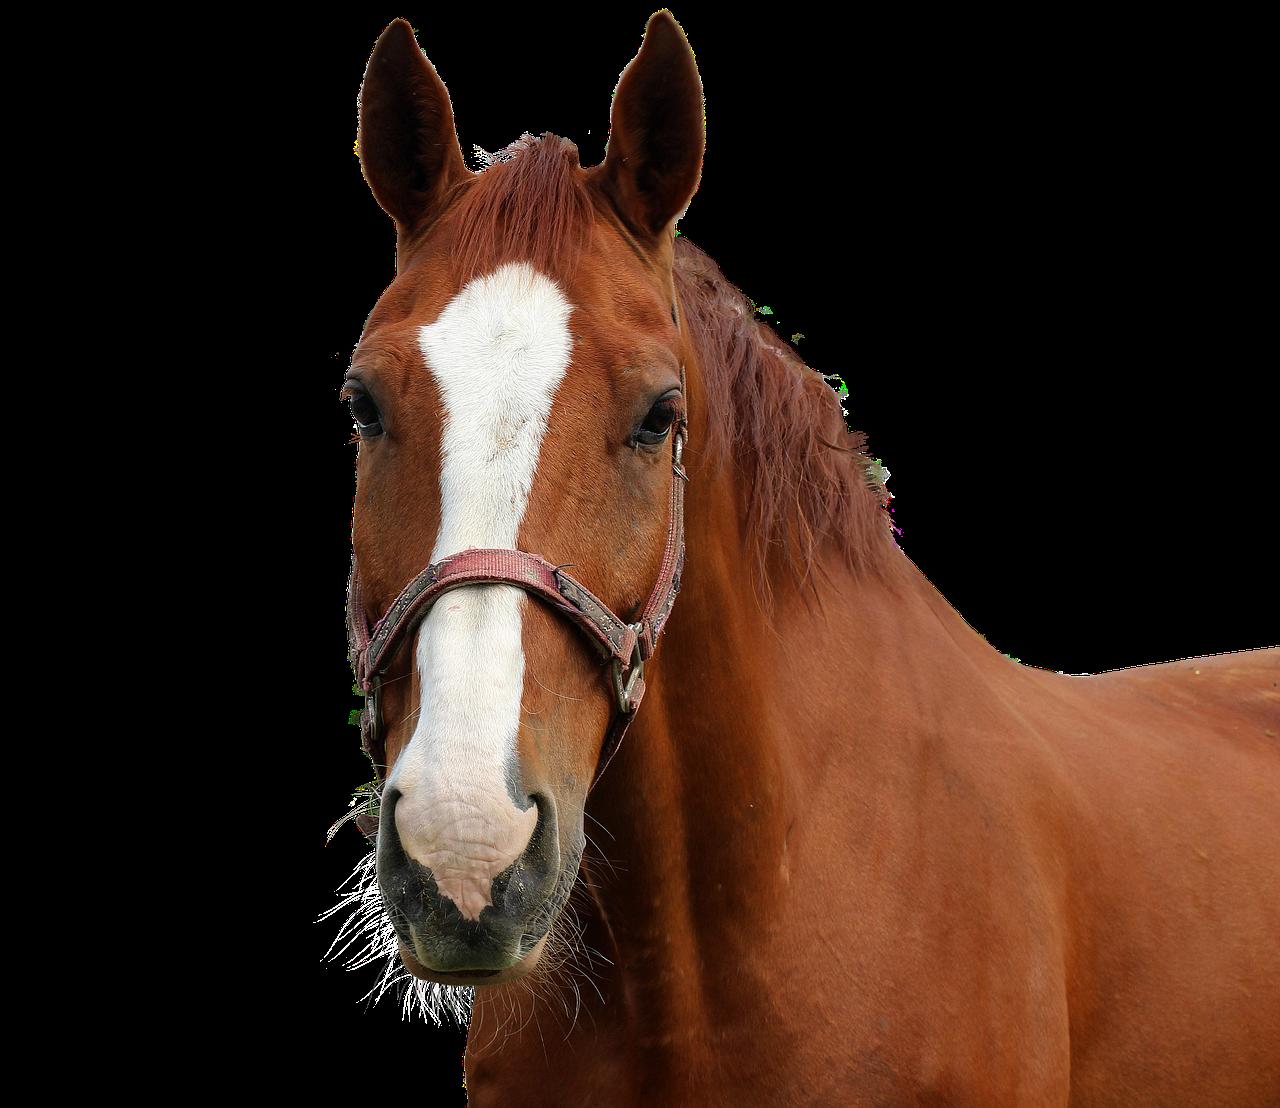 horse-3761496_1280